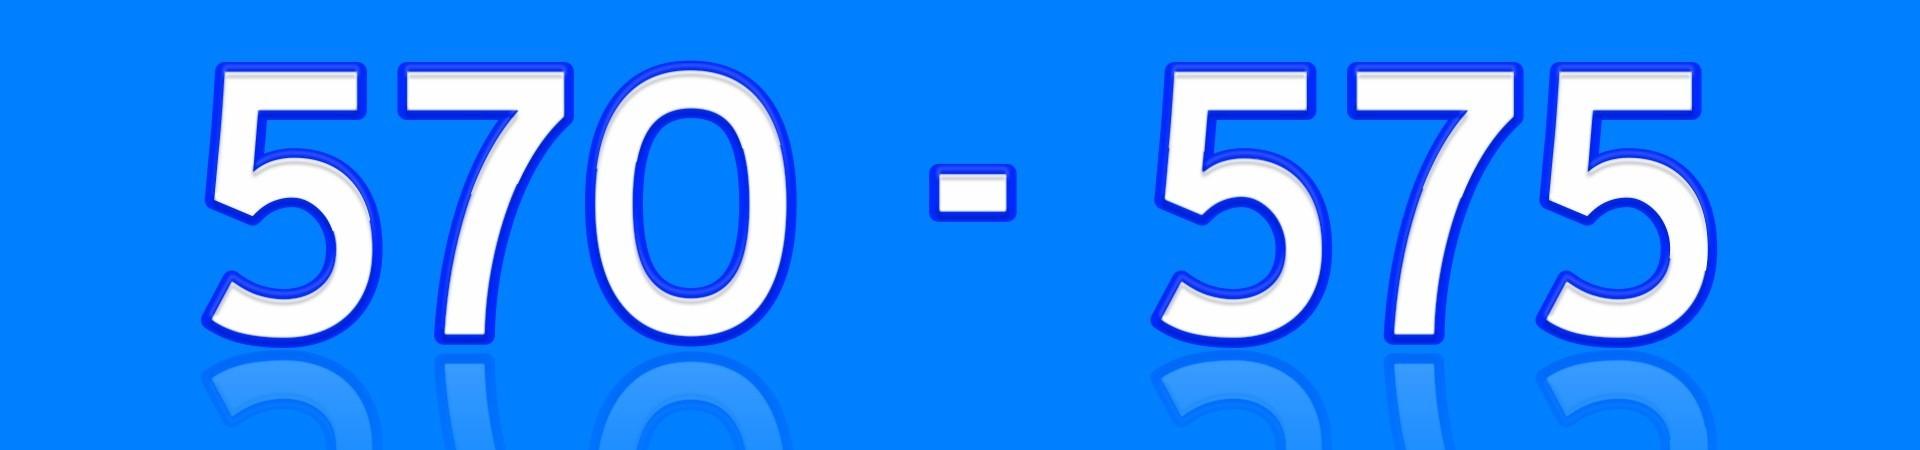 570 575